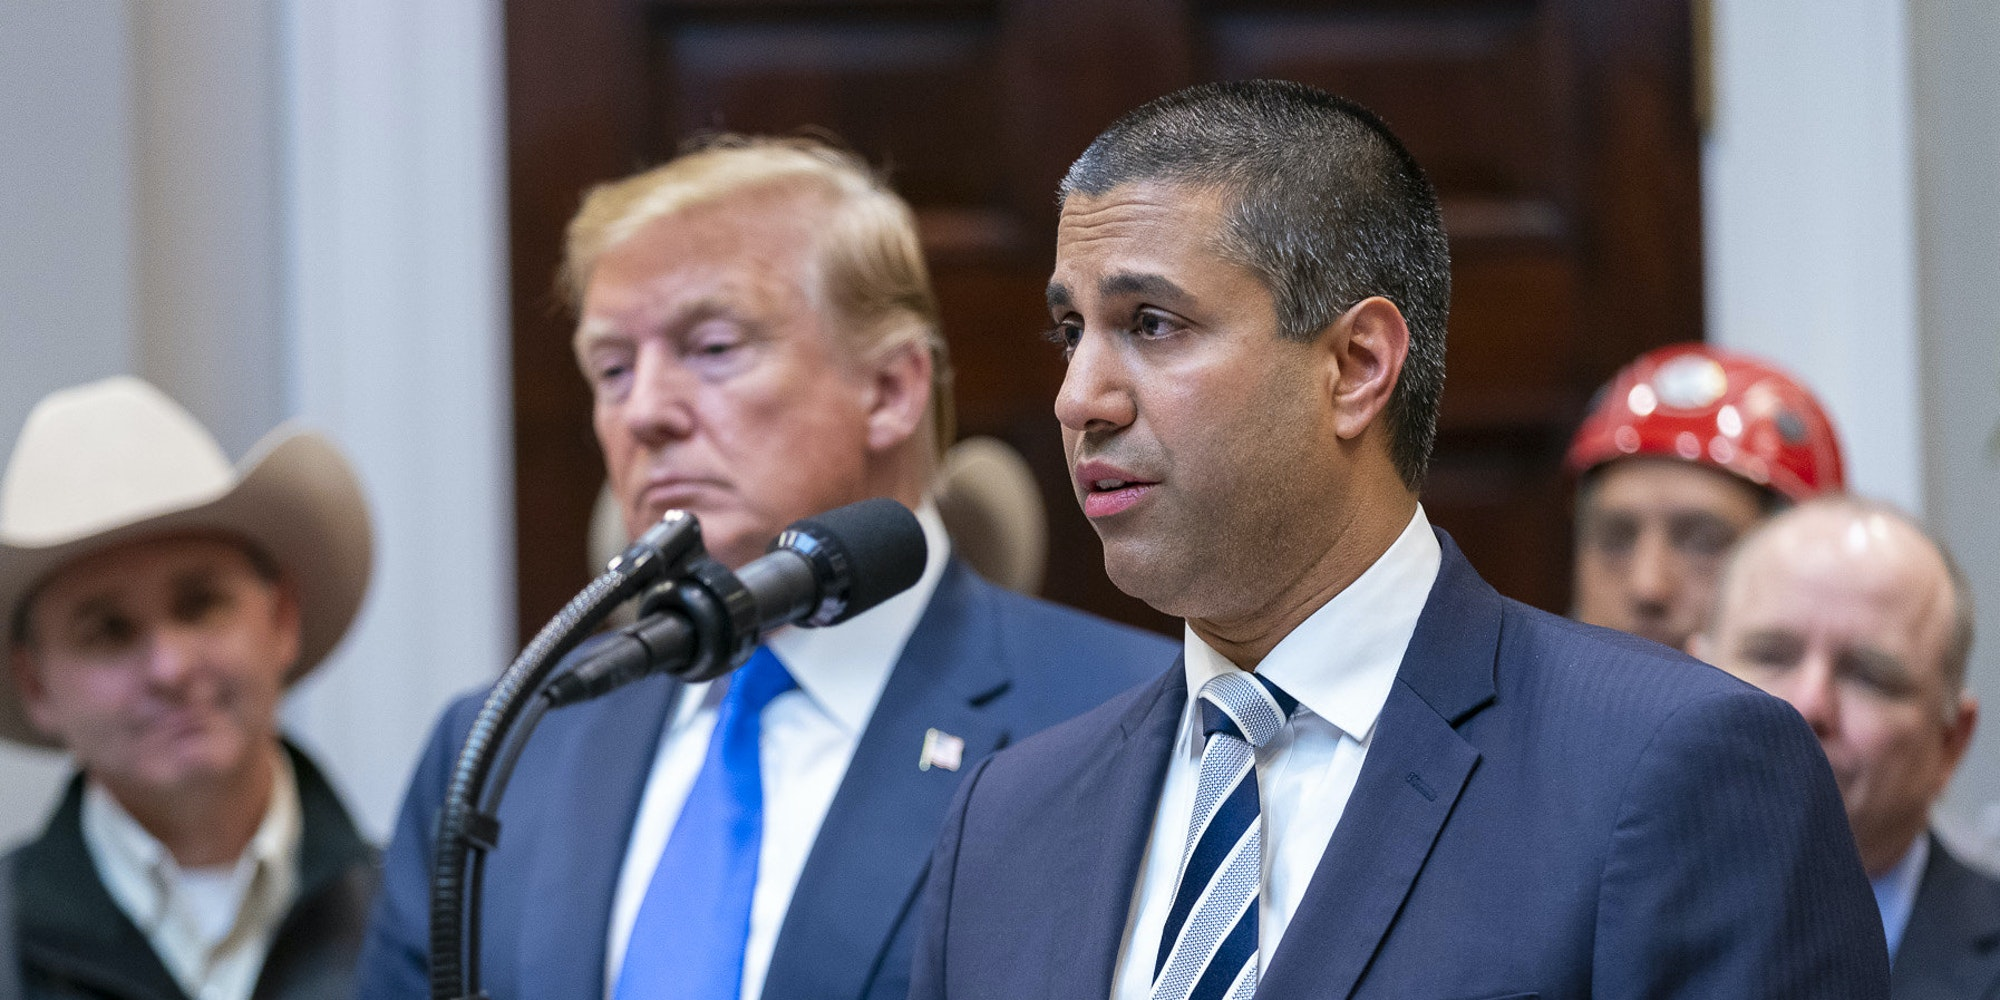 Ajit Pai Donald Trump Executive Order Section 230 FCC